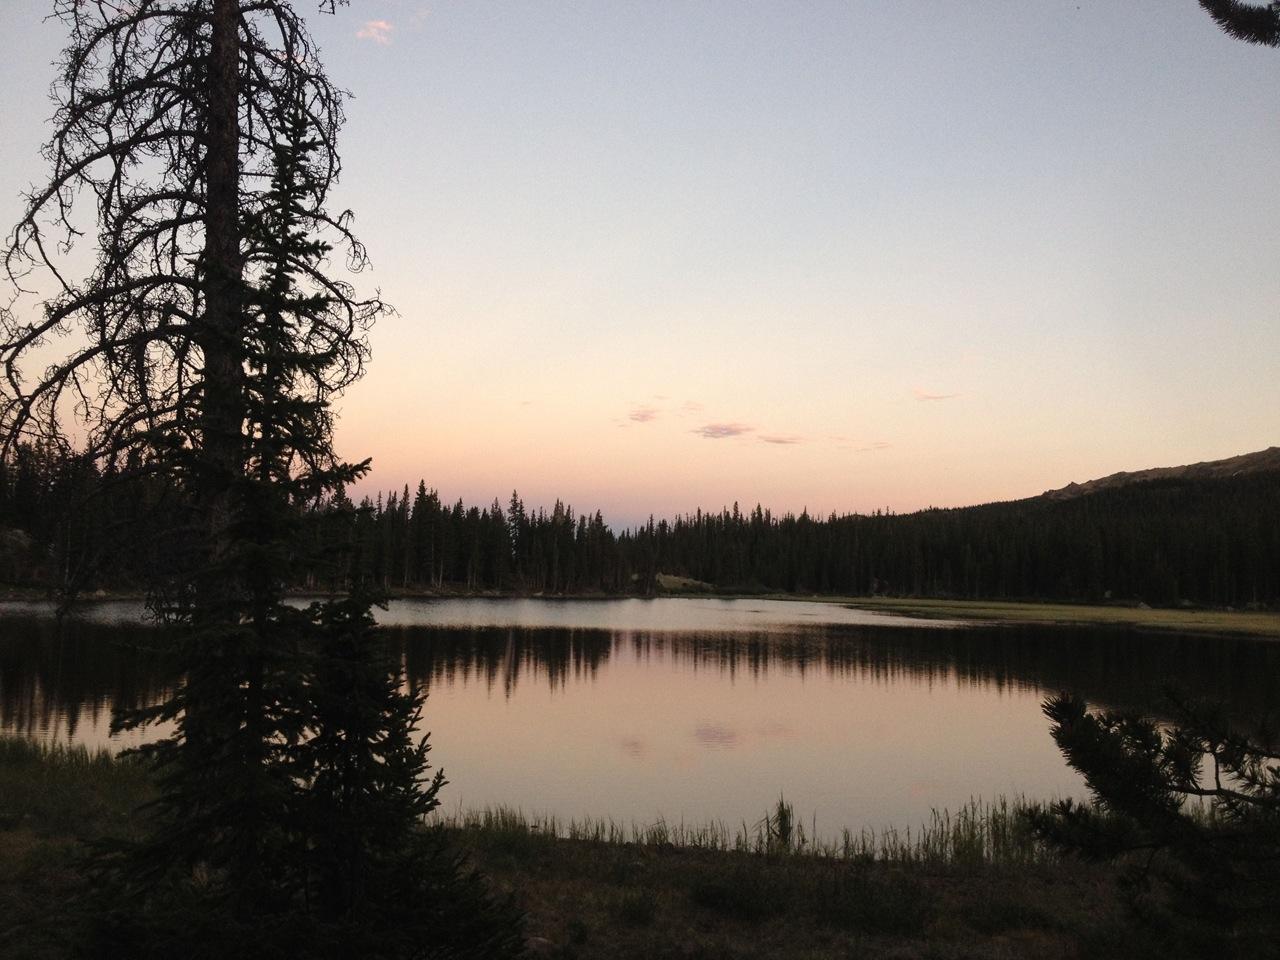 The Lake - Sunset